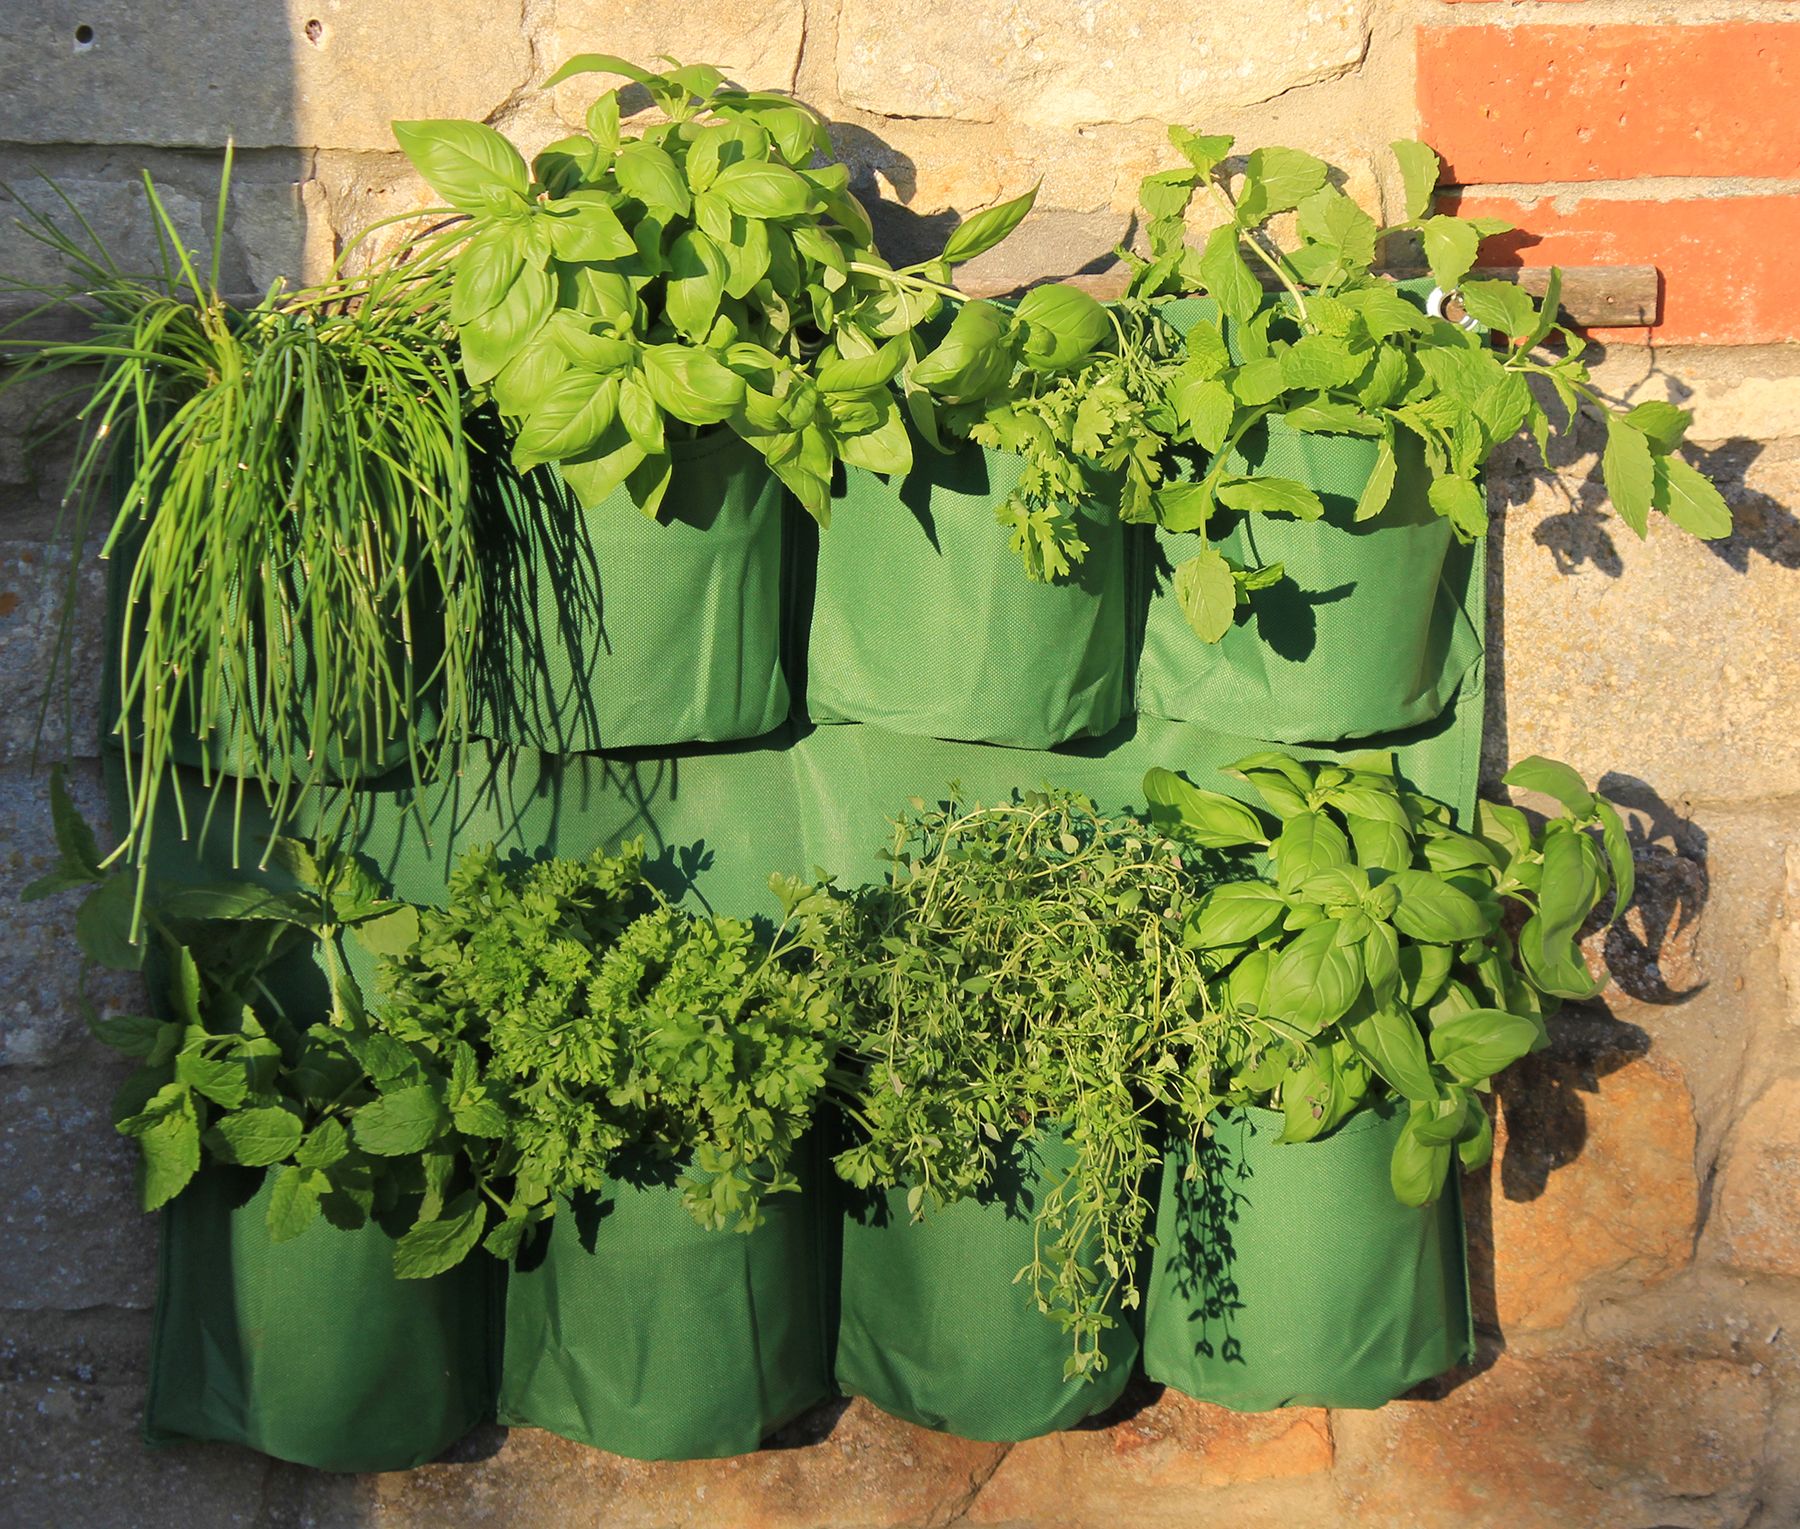 Haxnicks Herb Wall Planter.jpg